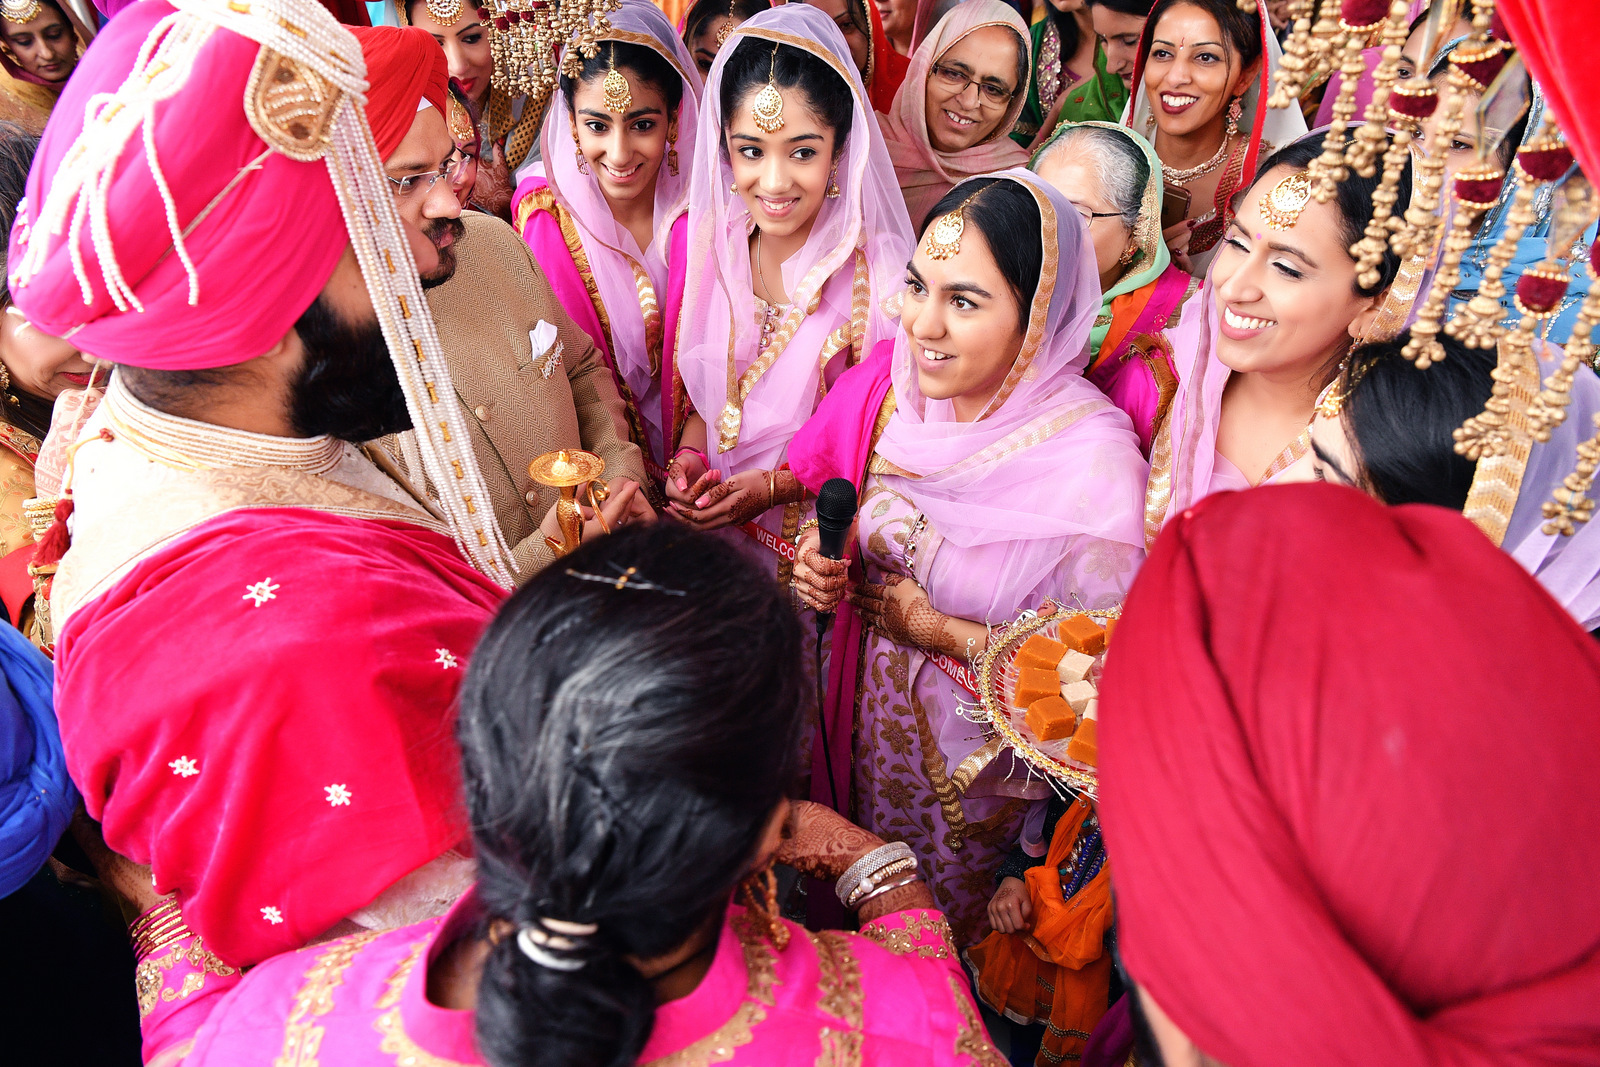 houston-weddings-manjot-karanjit-02.jpg